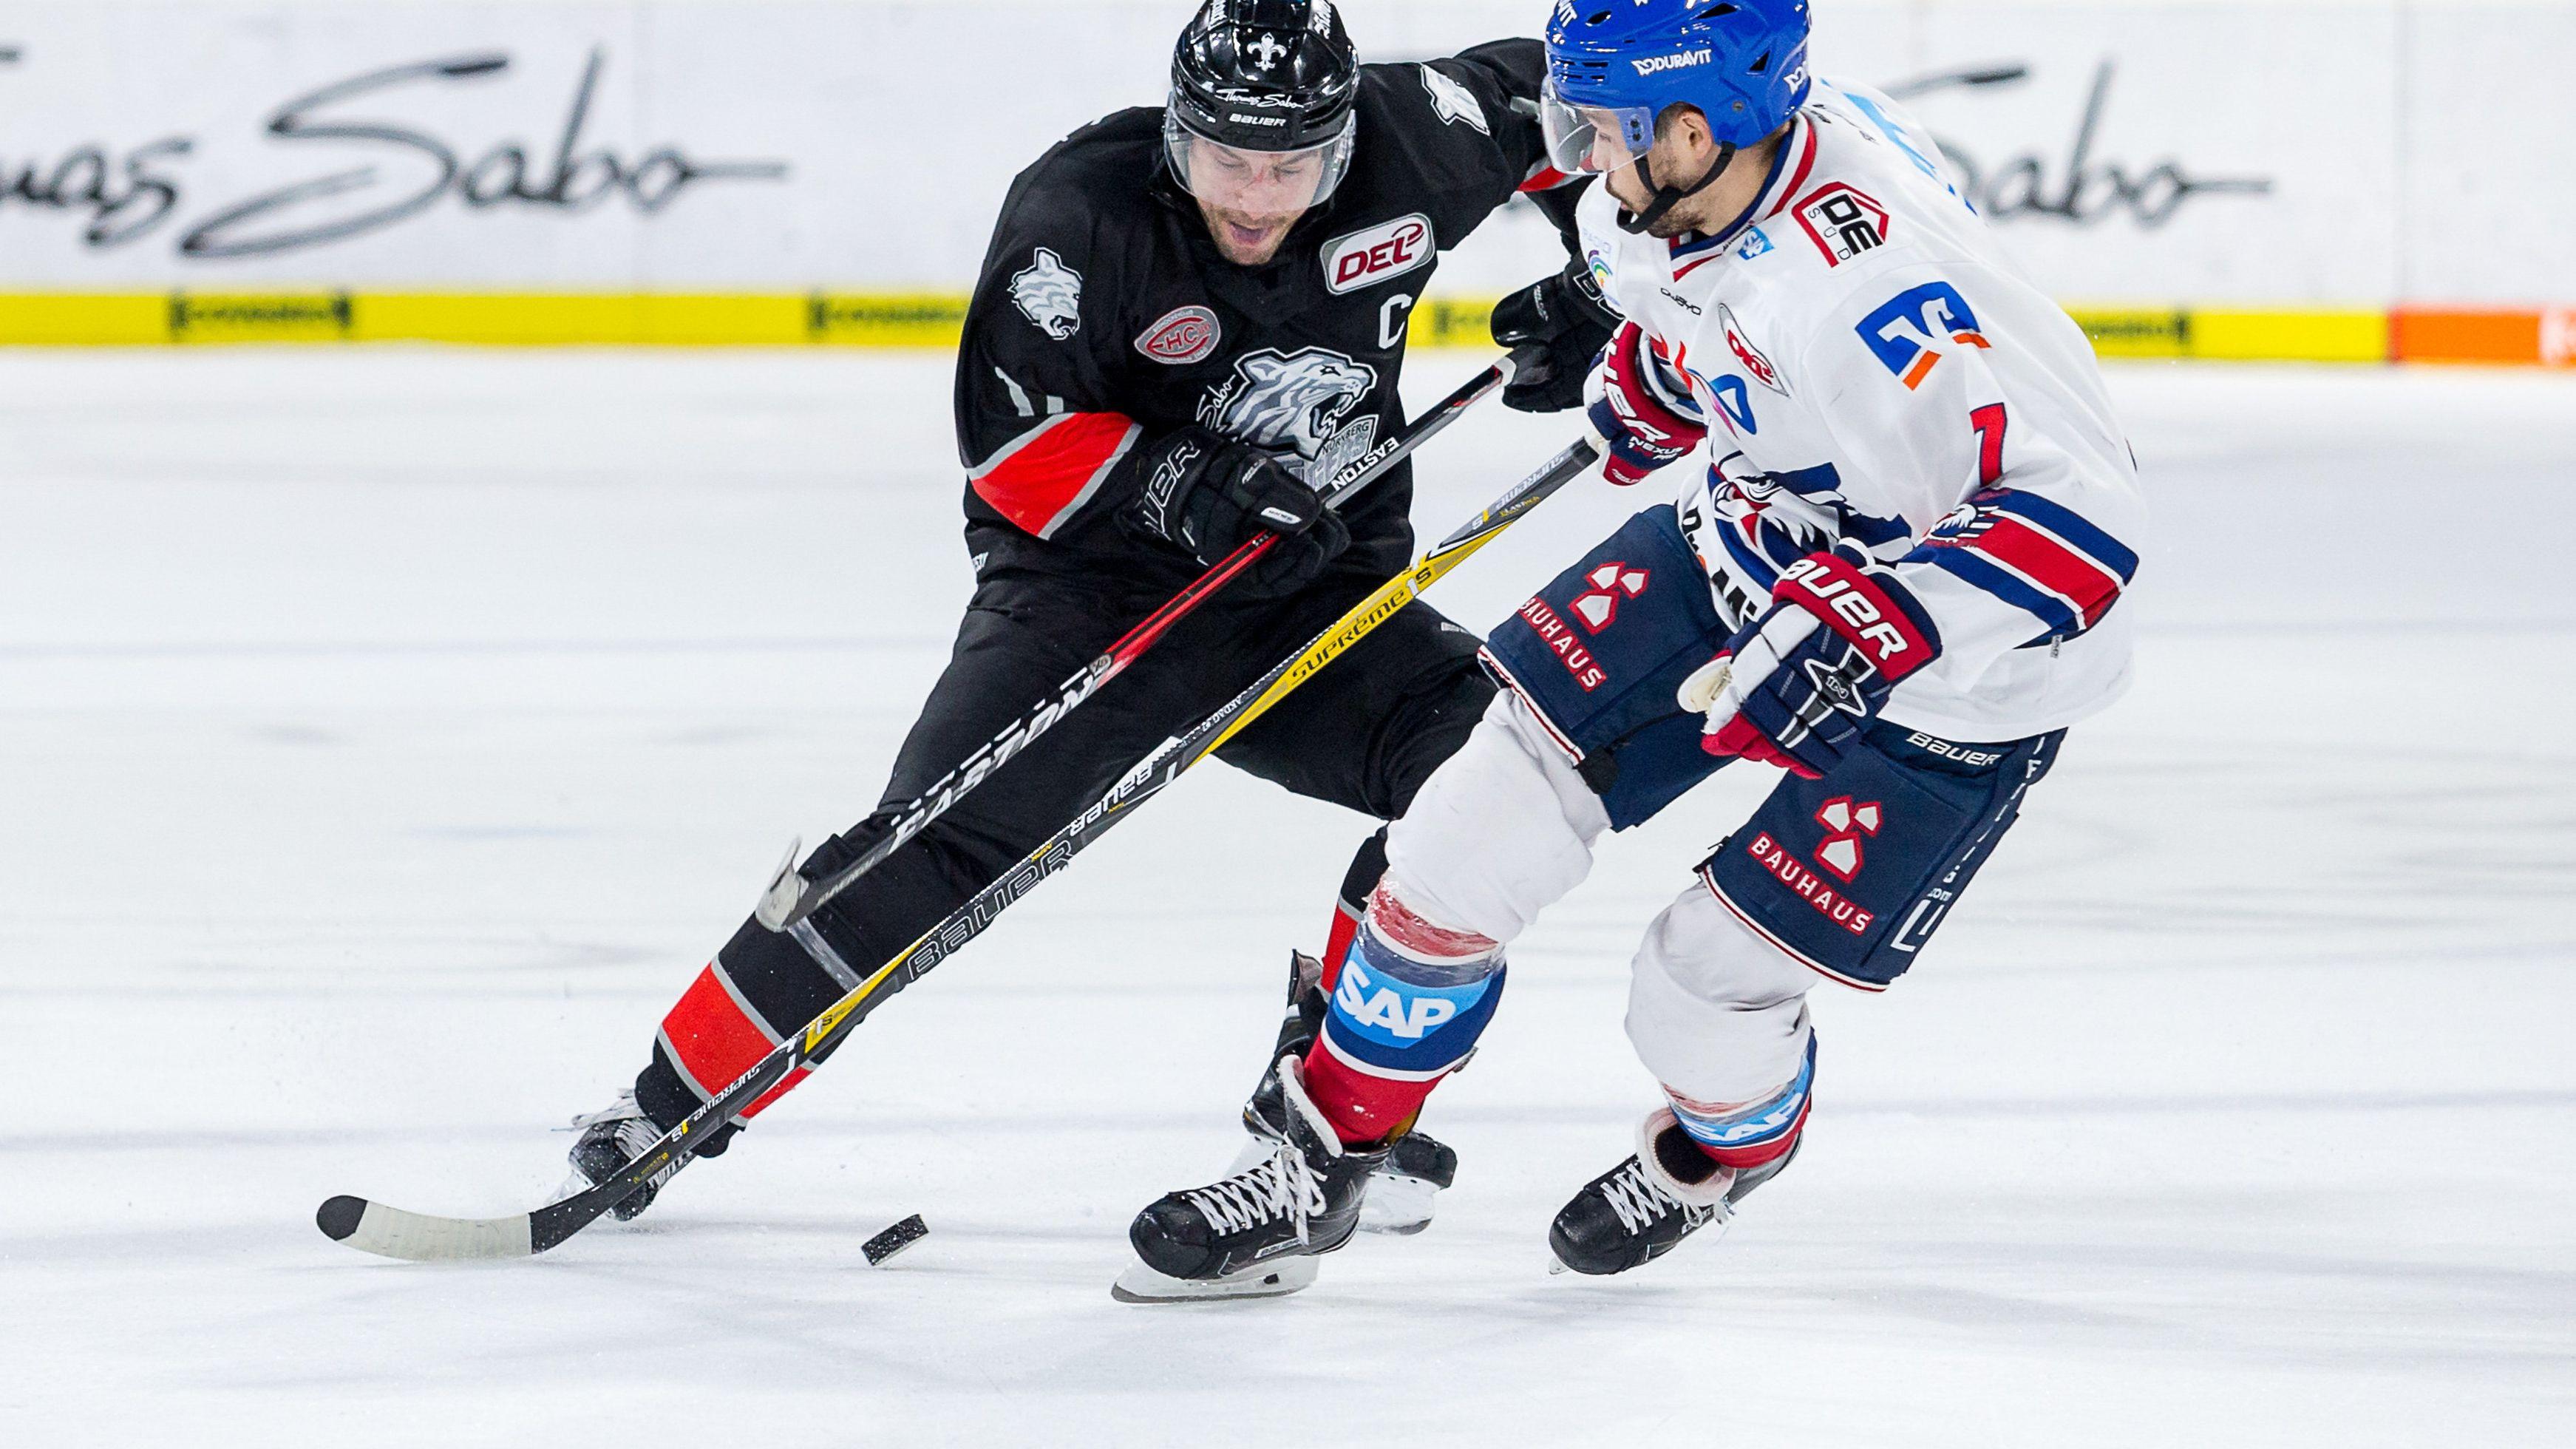 Ice Tigers Nuernberg vs. Adler Mannheim